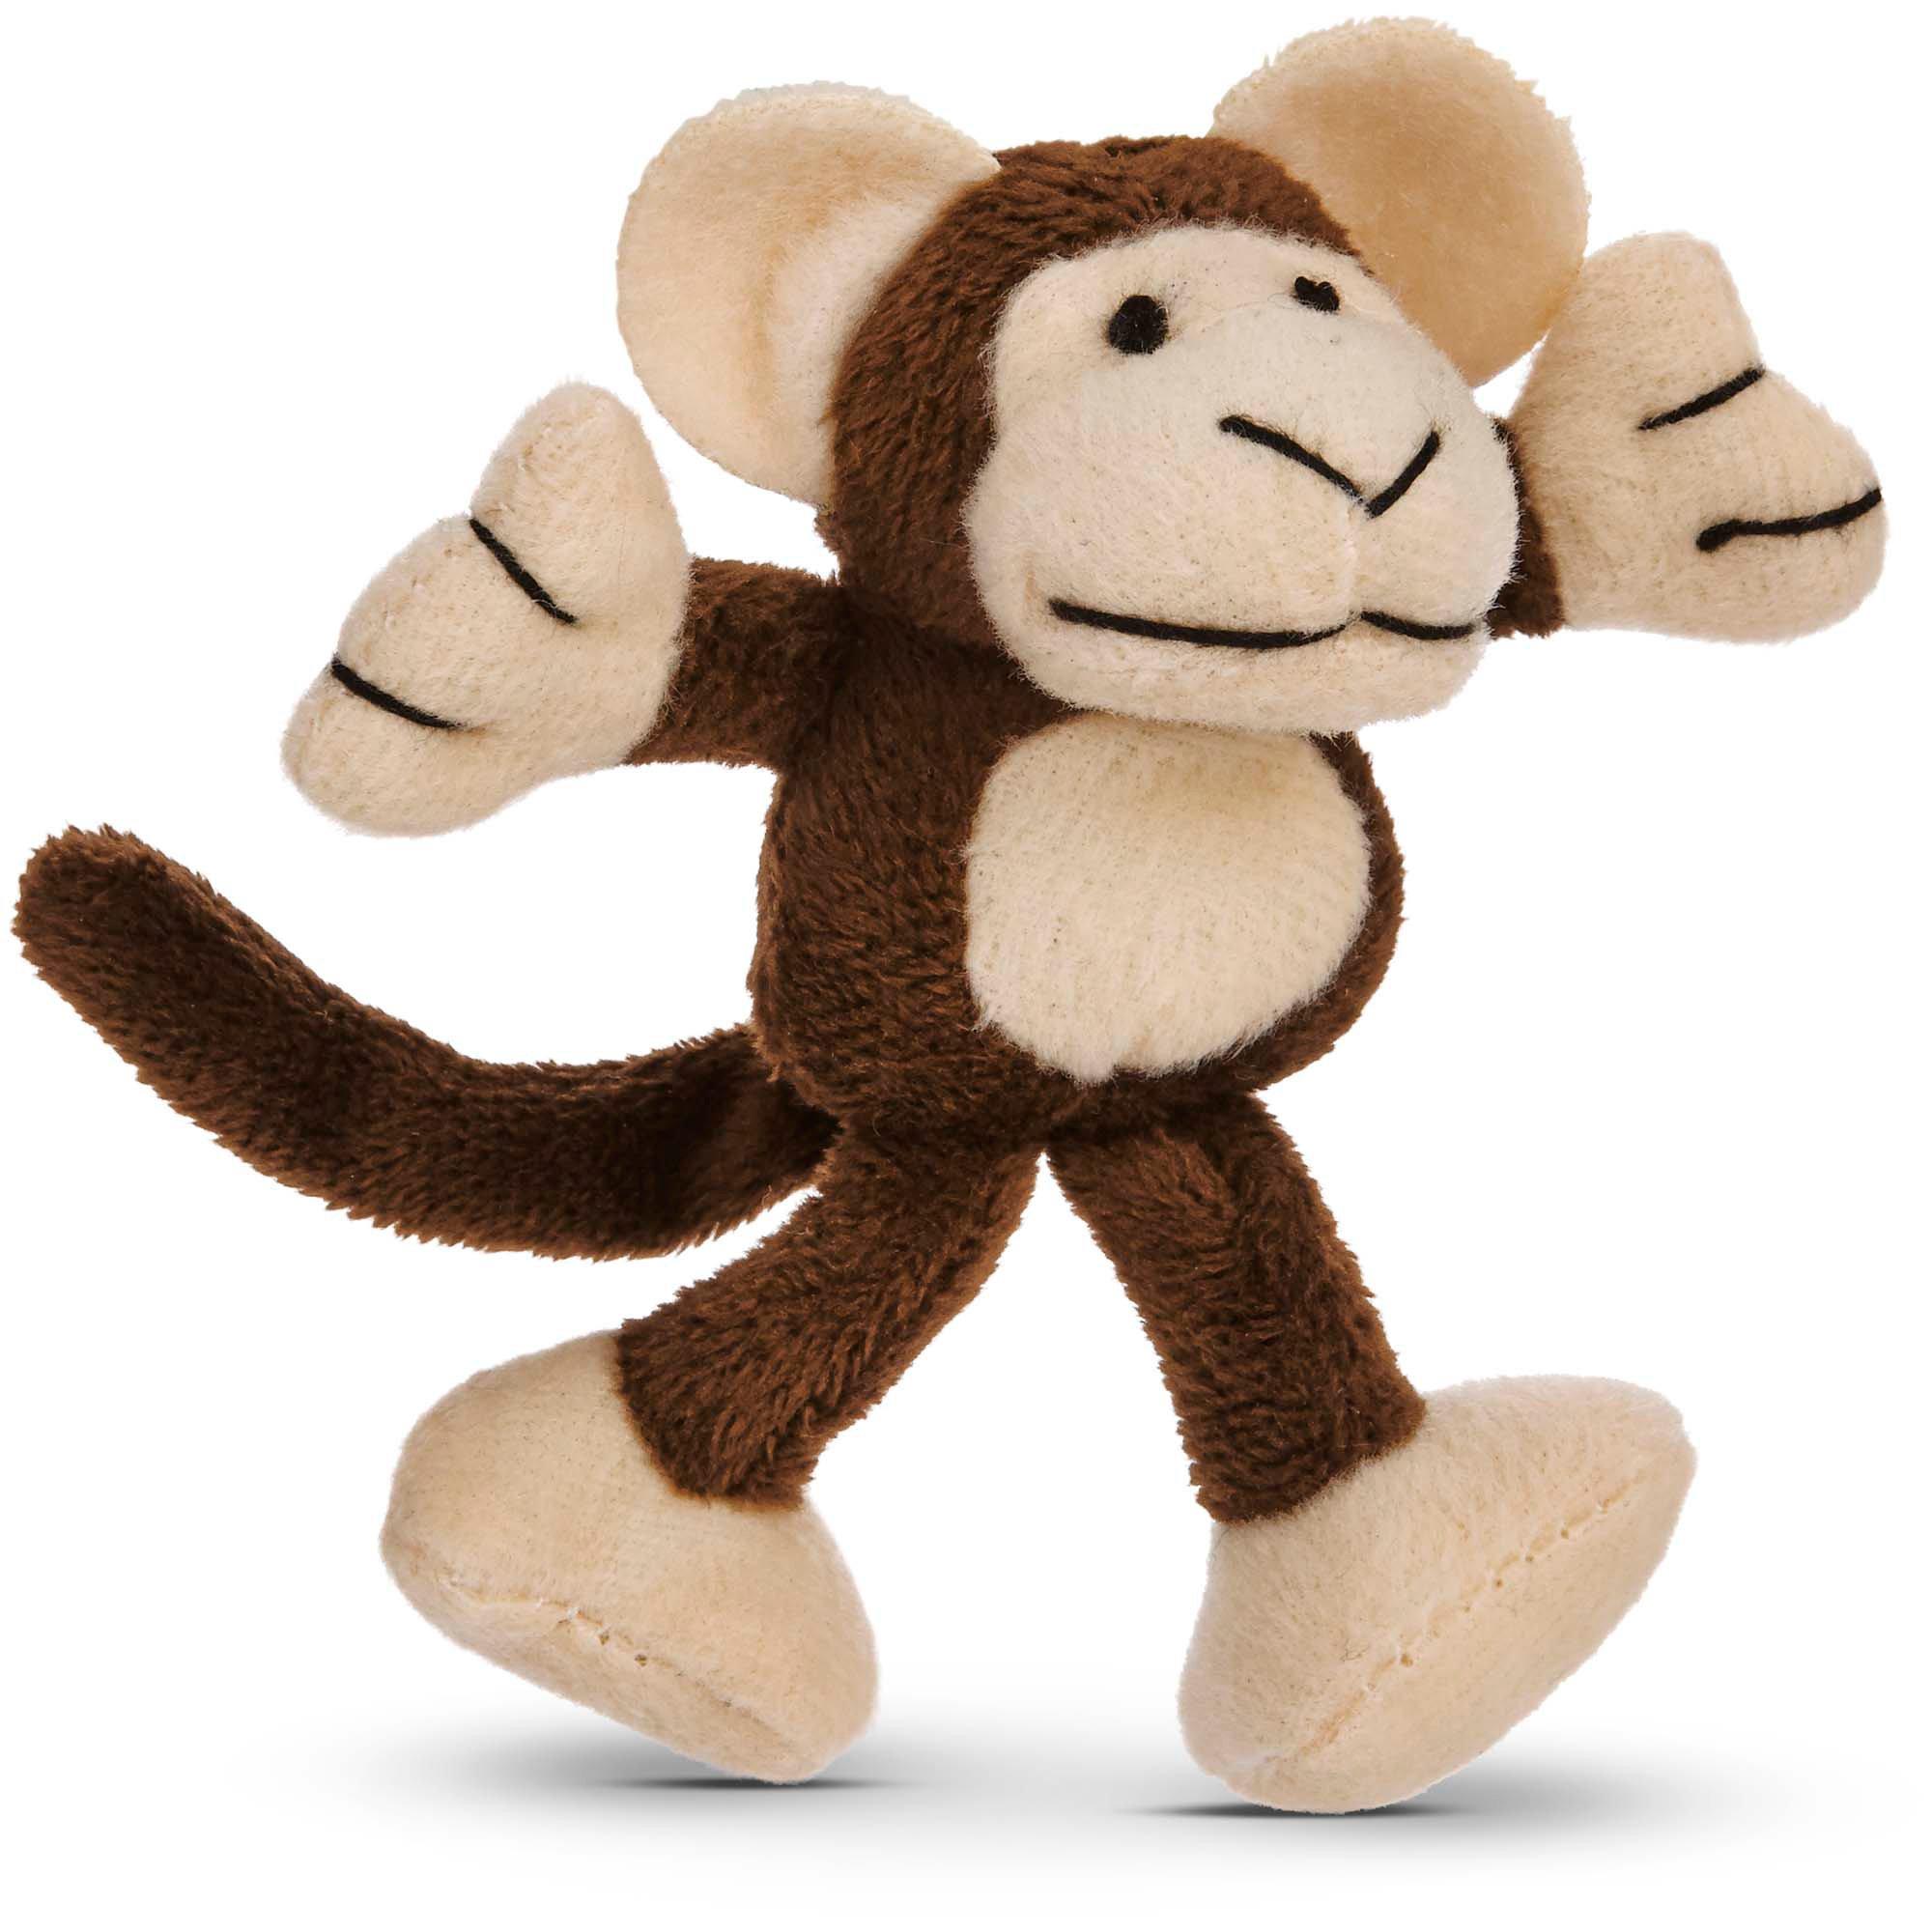 Leaps & Bounds Cuddle Monkey Catnip Cat Toy